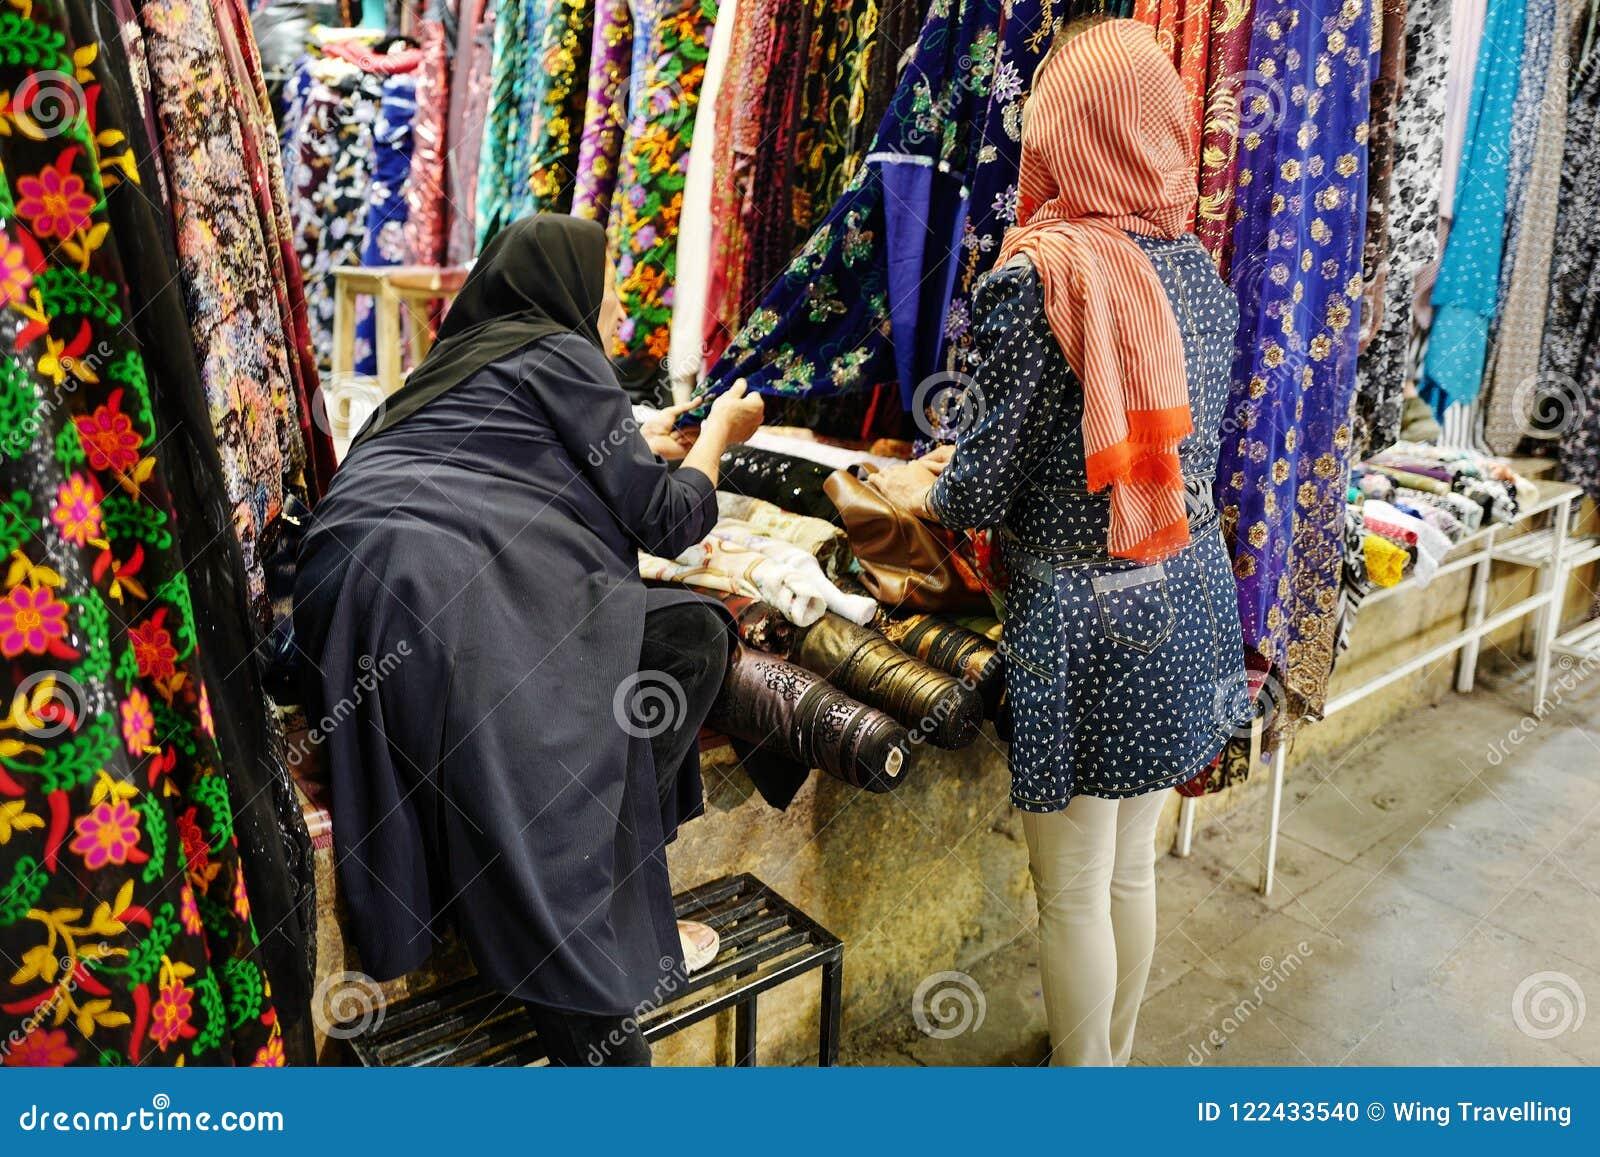 Bazaar in Iran editorial image  Image of people, esfahan